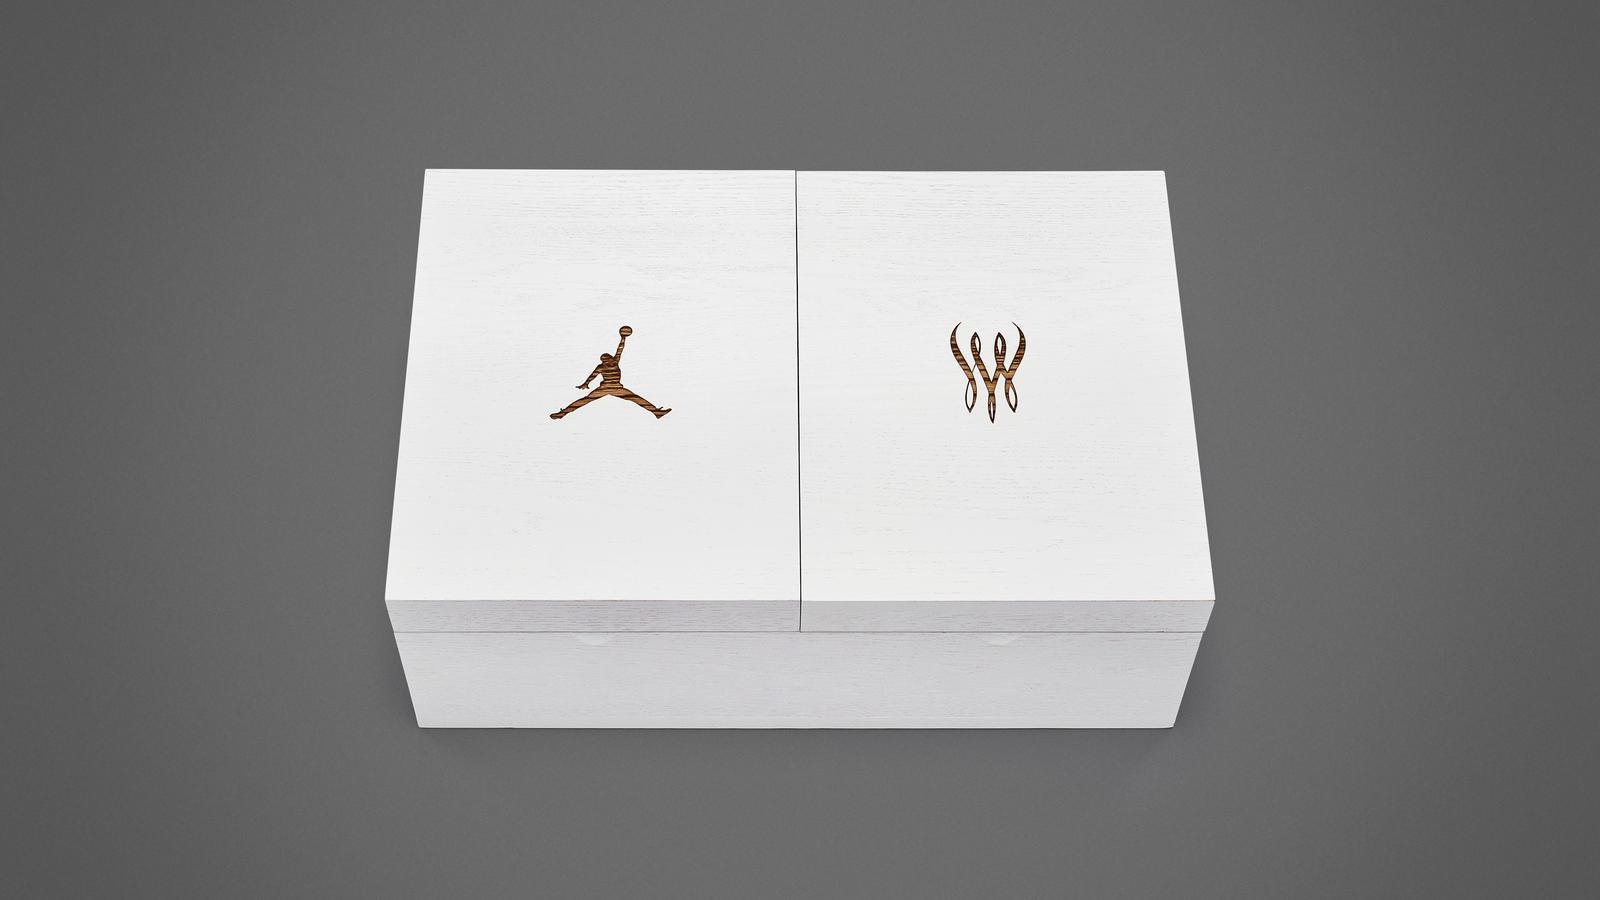 Nike and Jordan Brand Celebrate Serena\'s #23 VICTORY.